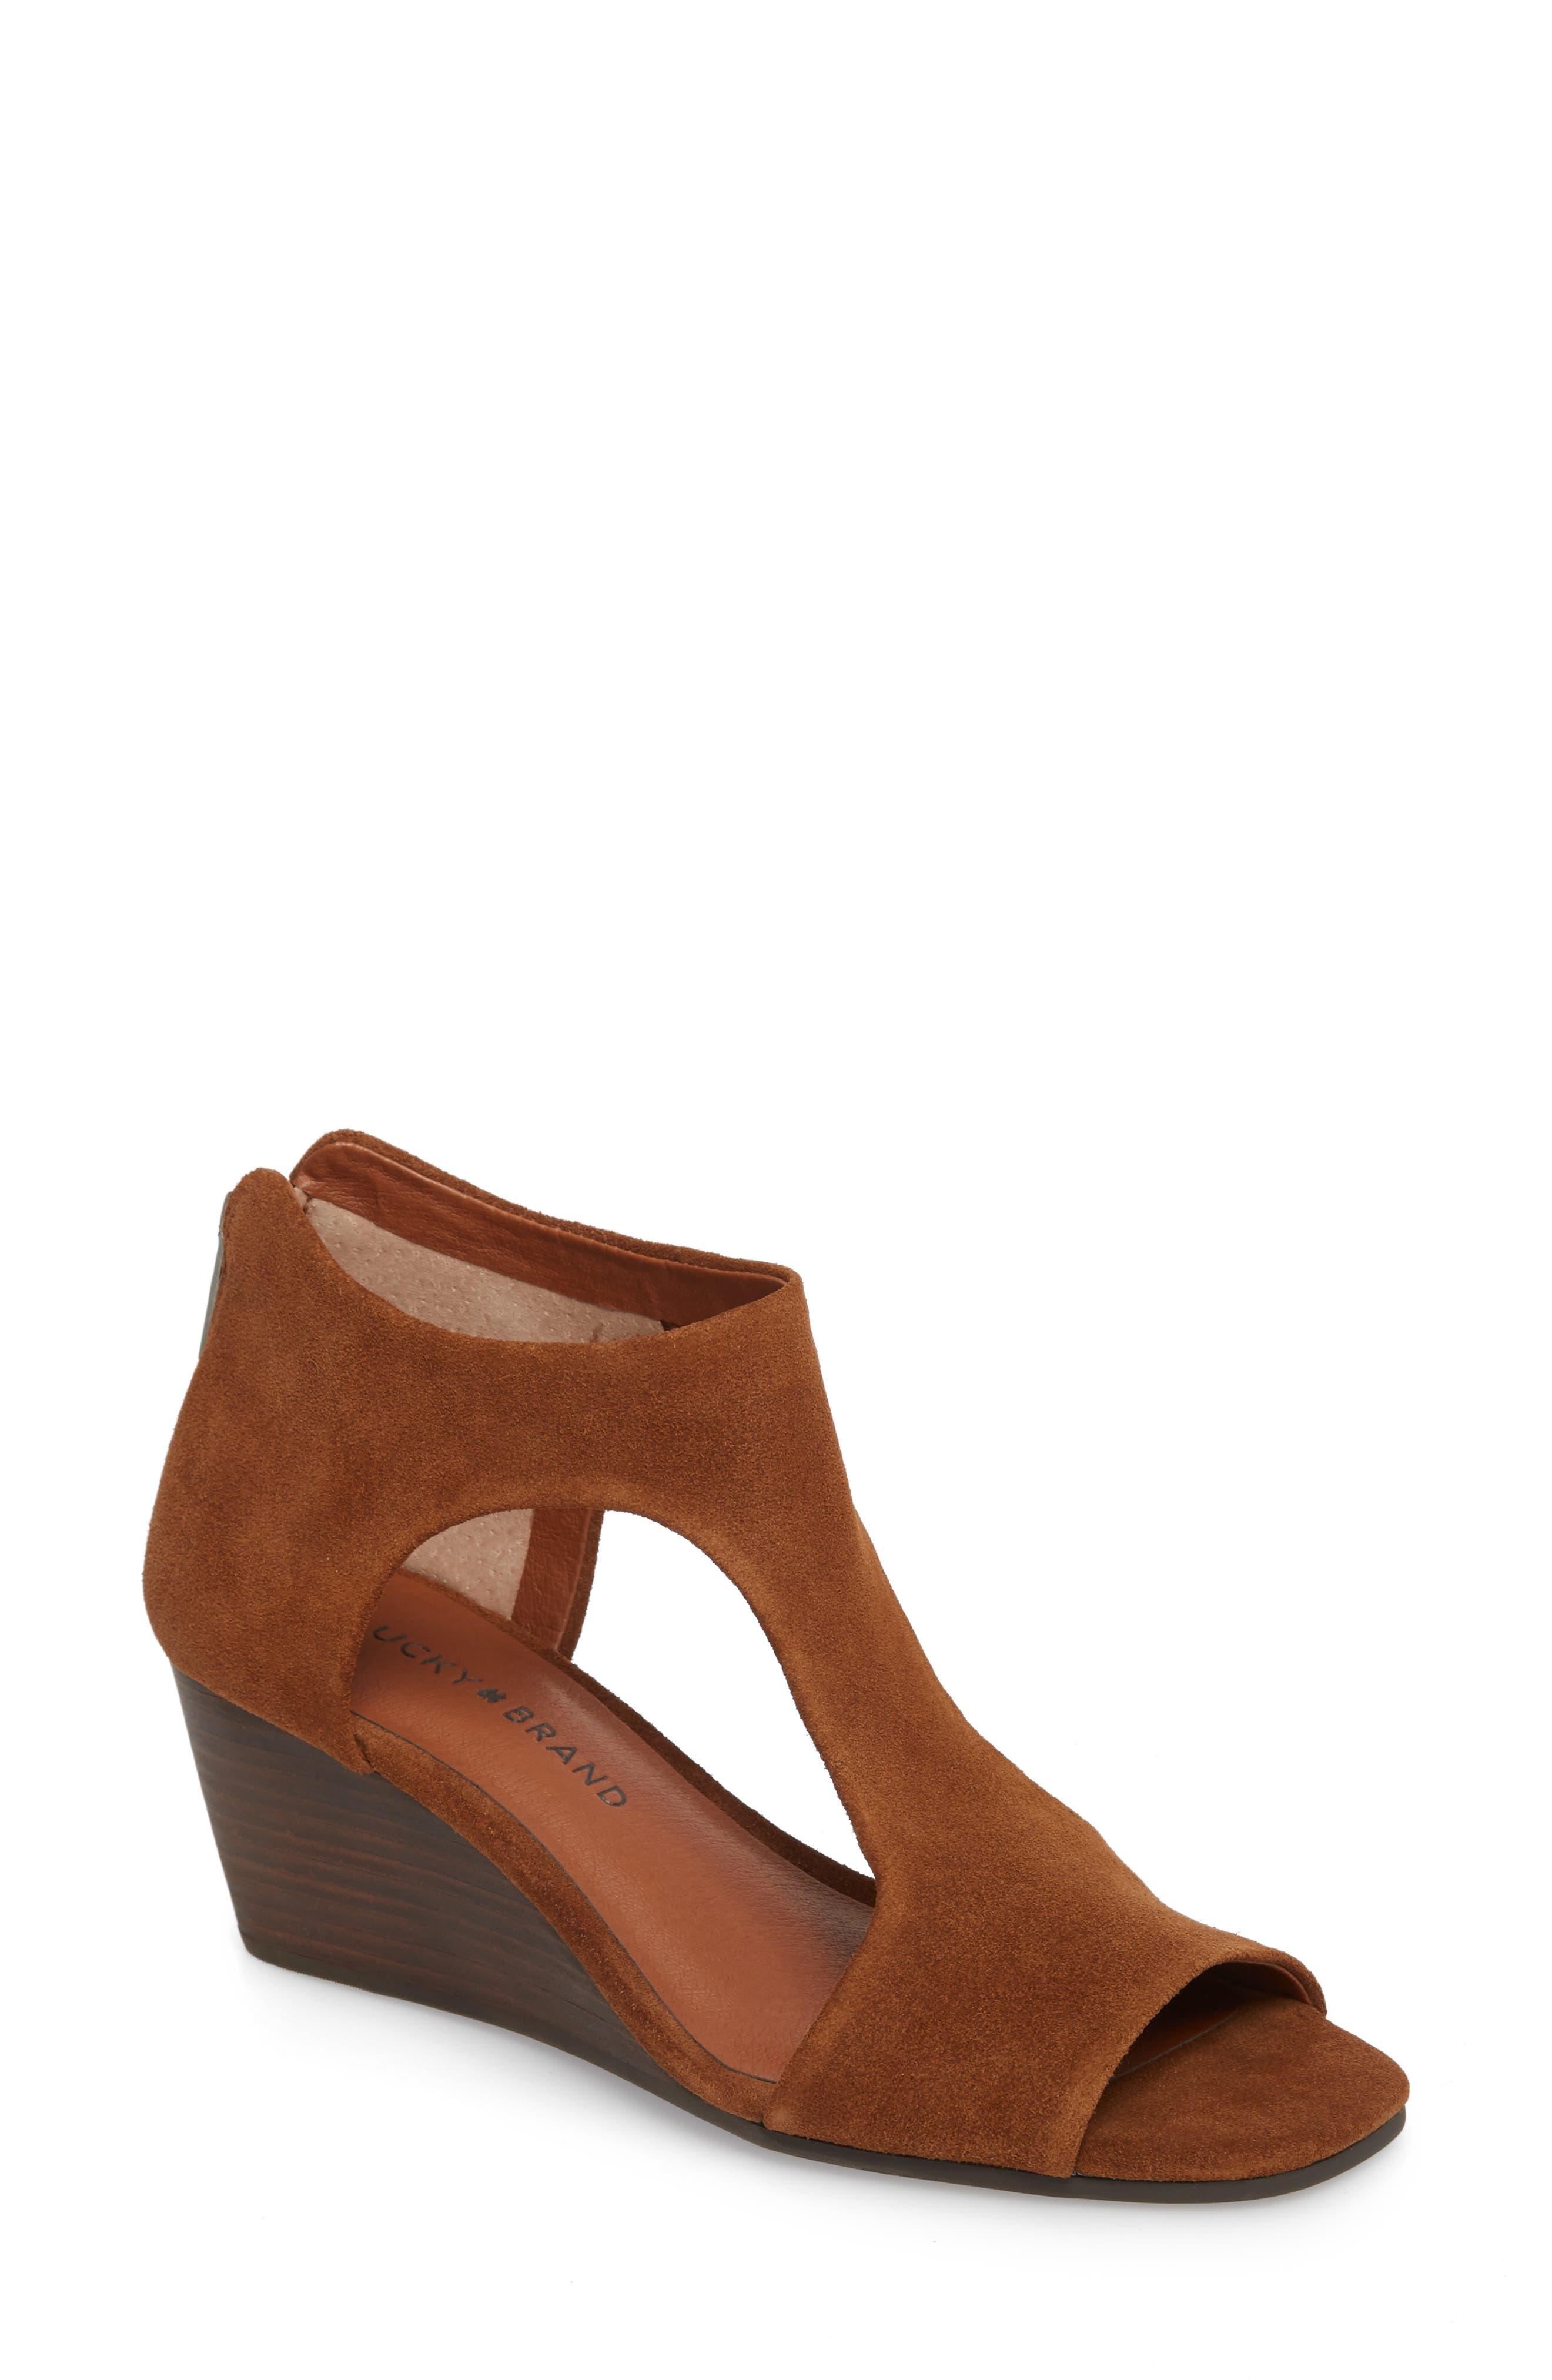 Tehirr Wedge Sandal,                             Main thumbnail 1, color,                             Cedar Suede